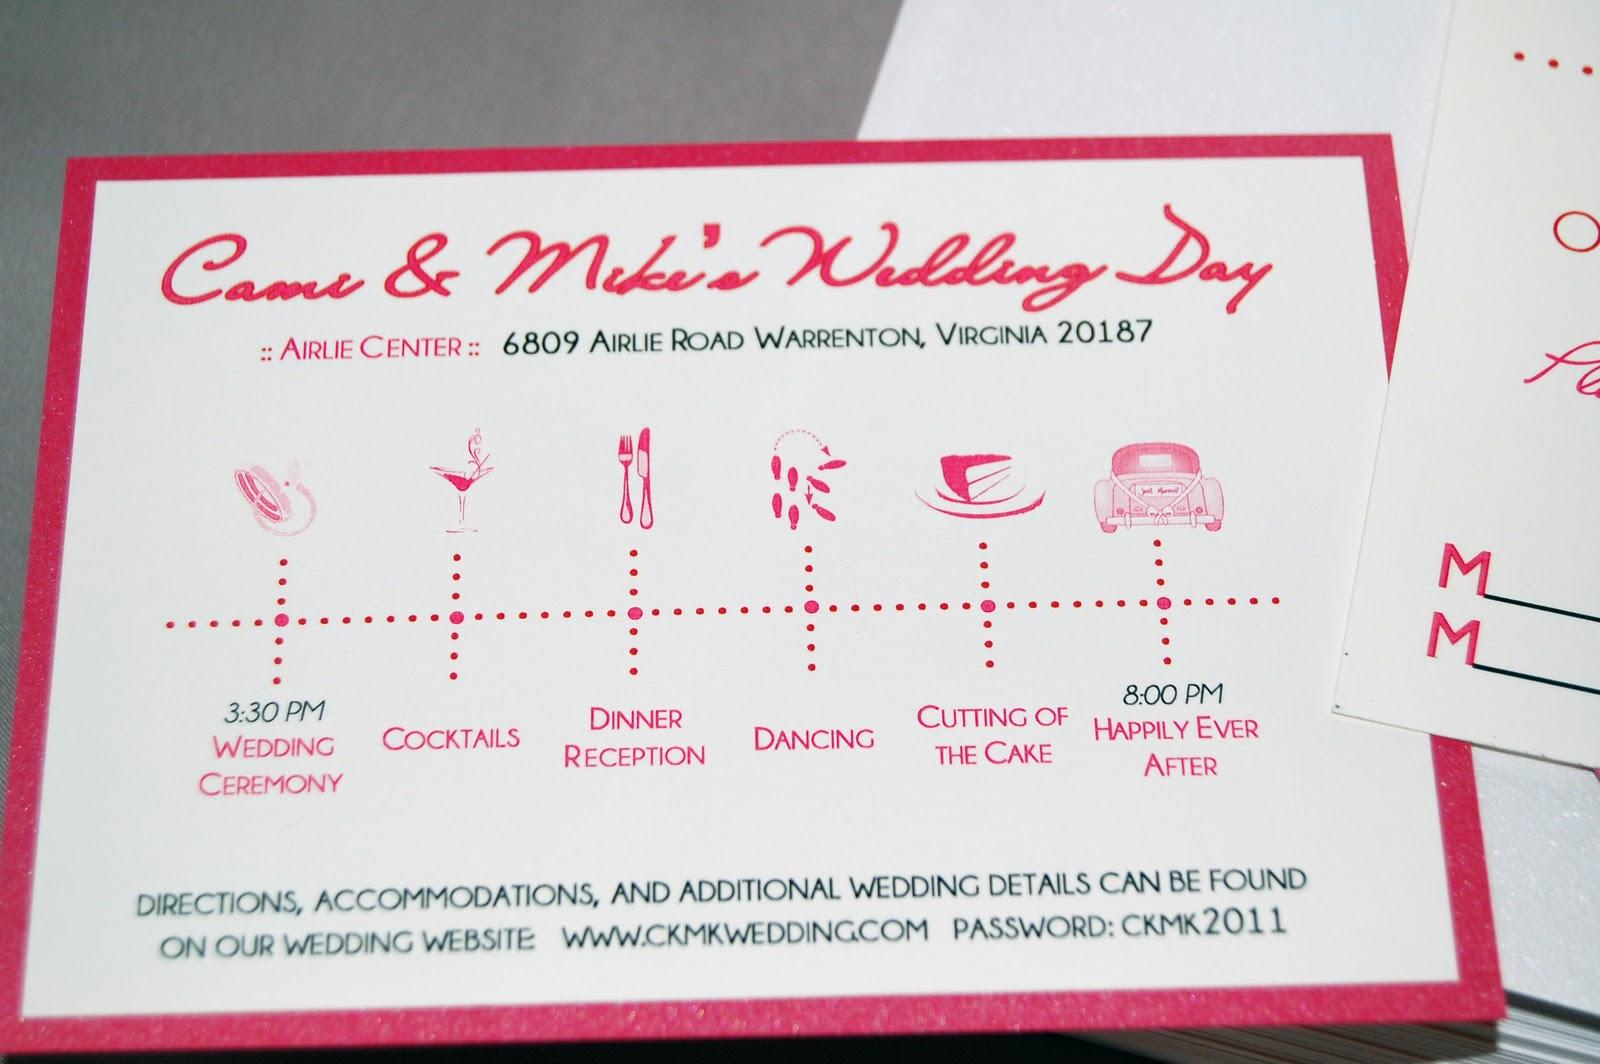 Wedding Timeline Invitations: Fine Prints: Cami's Dark Pink And Red Wedding Invitations